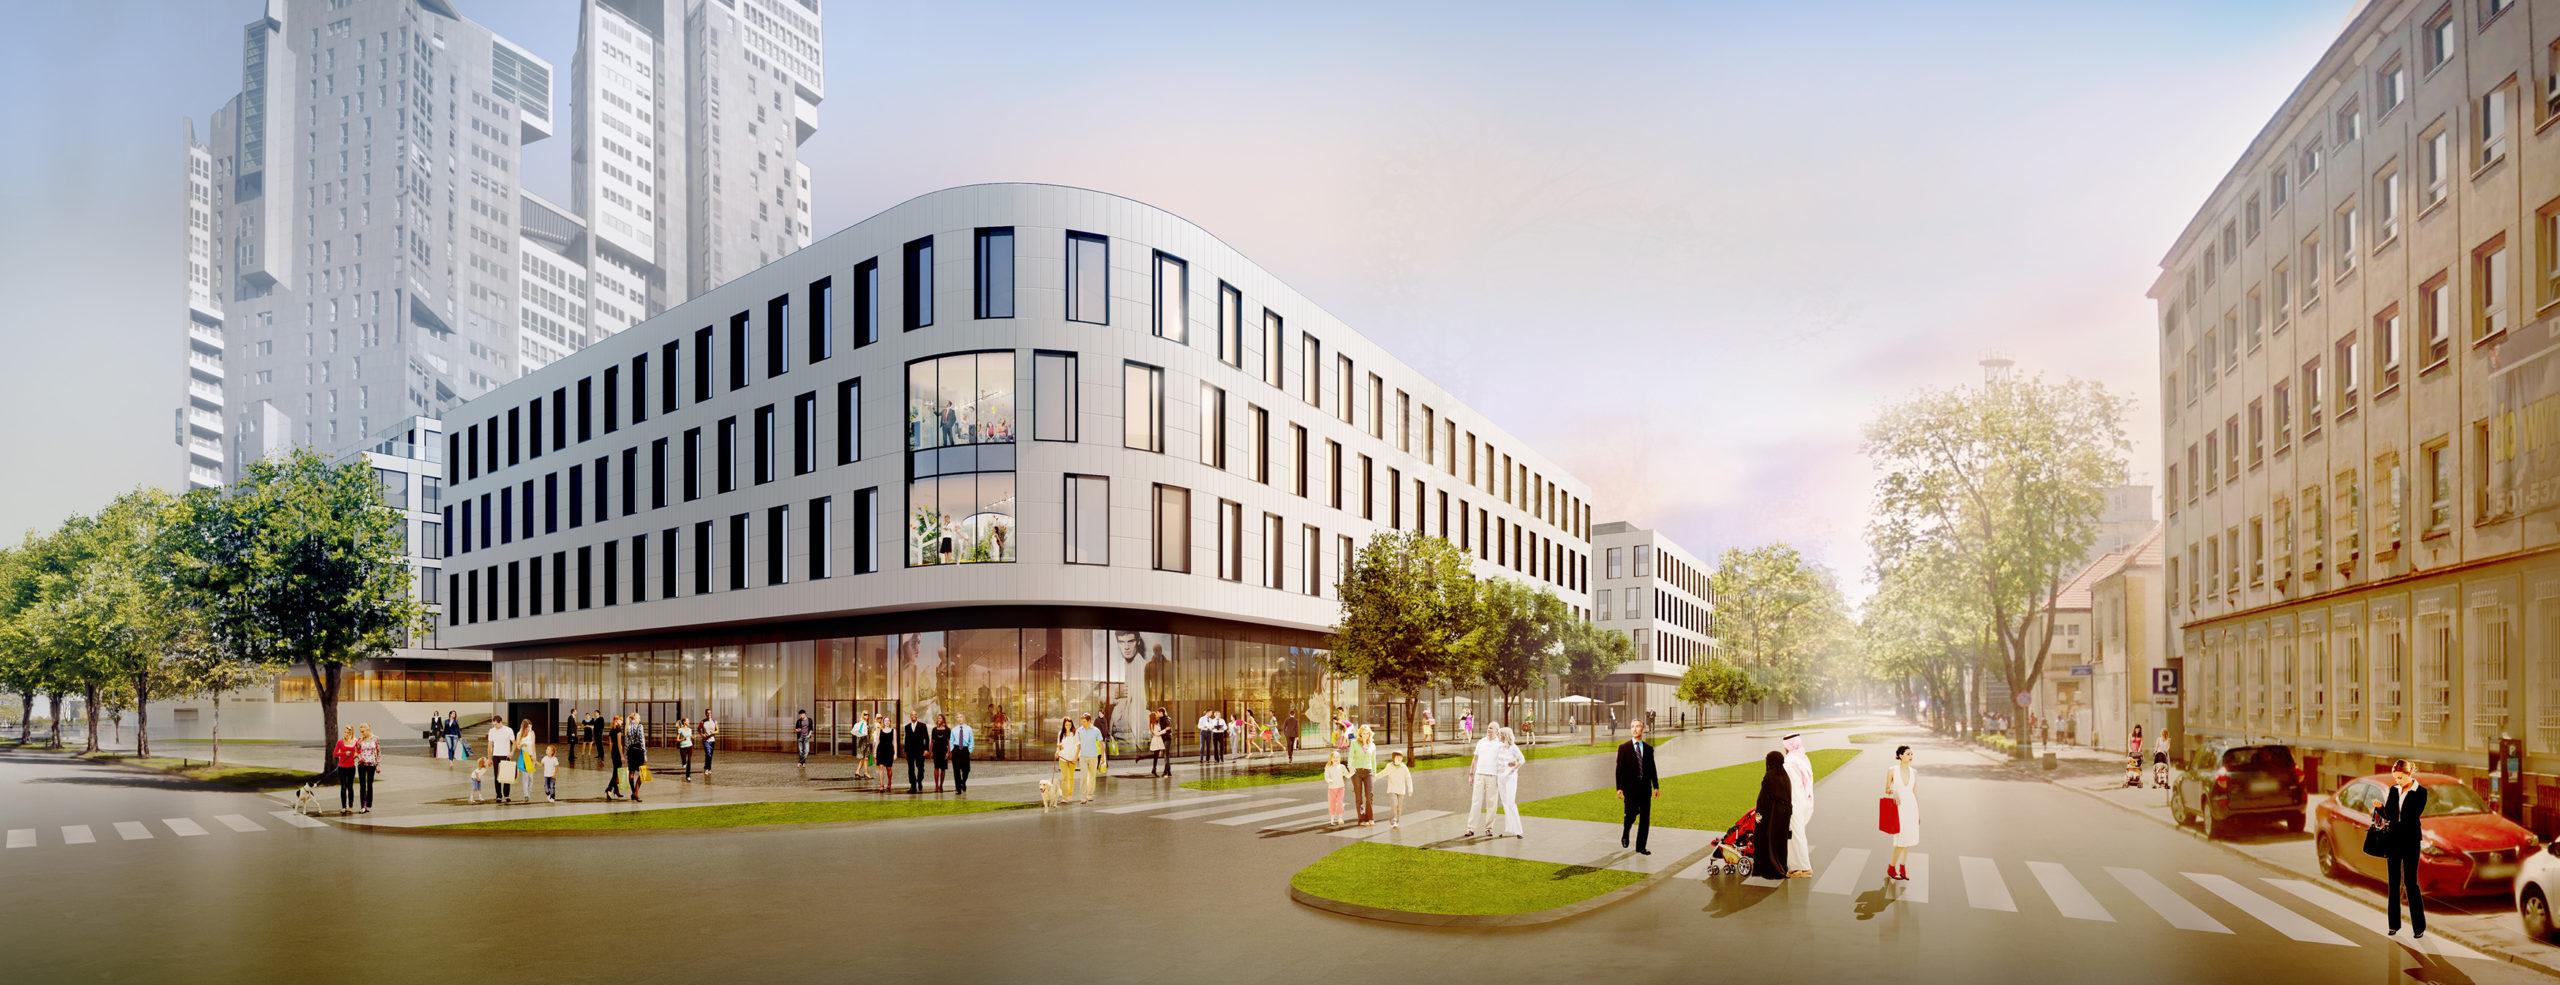 GDYNIA-Waterfront-Housing-MJZ-2